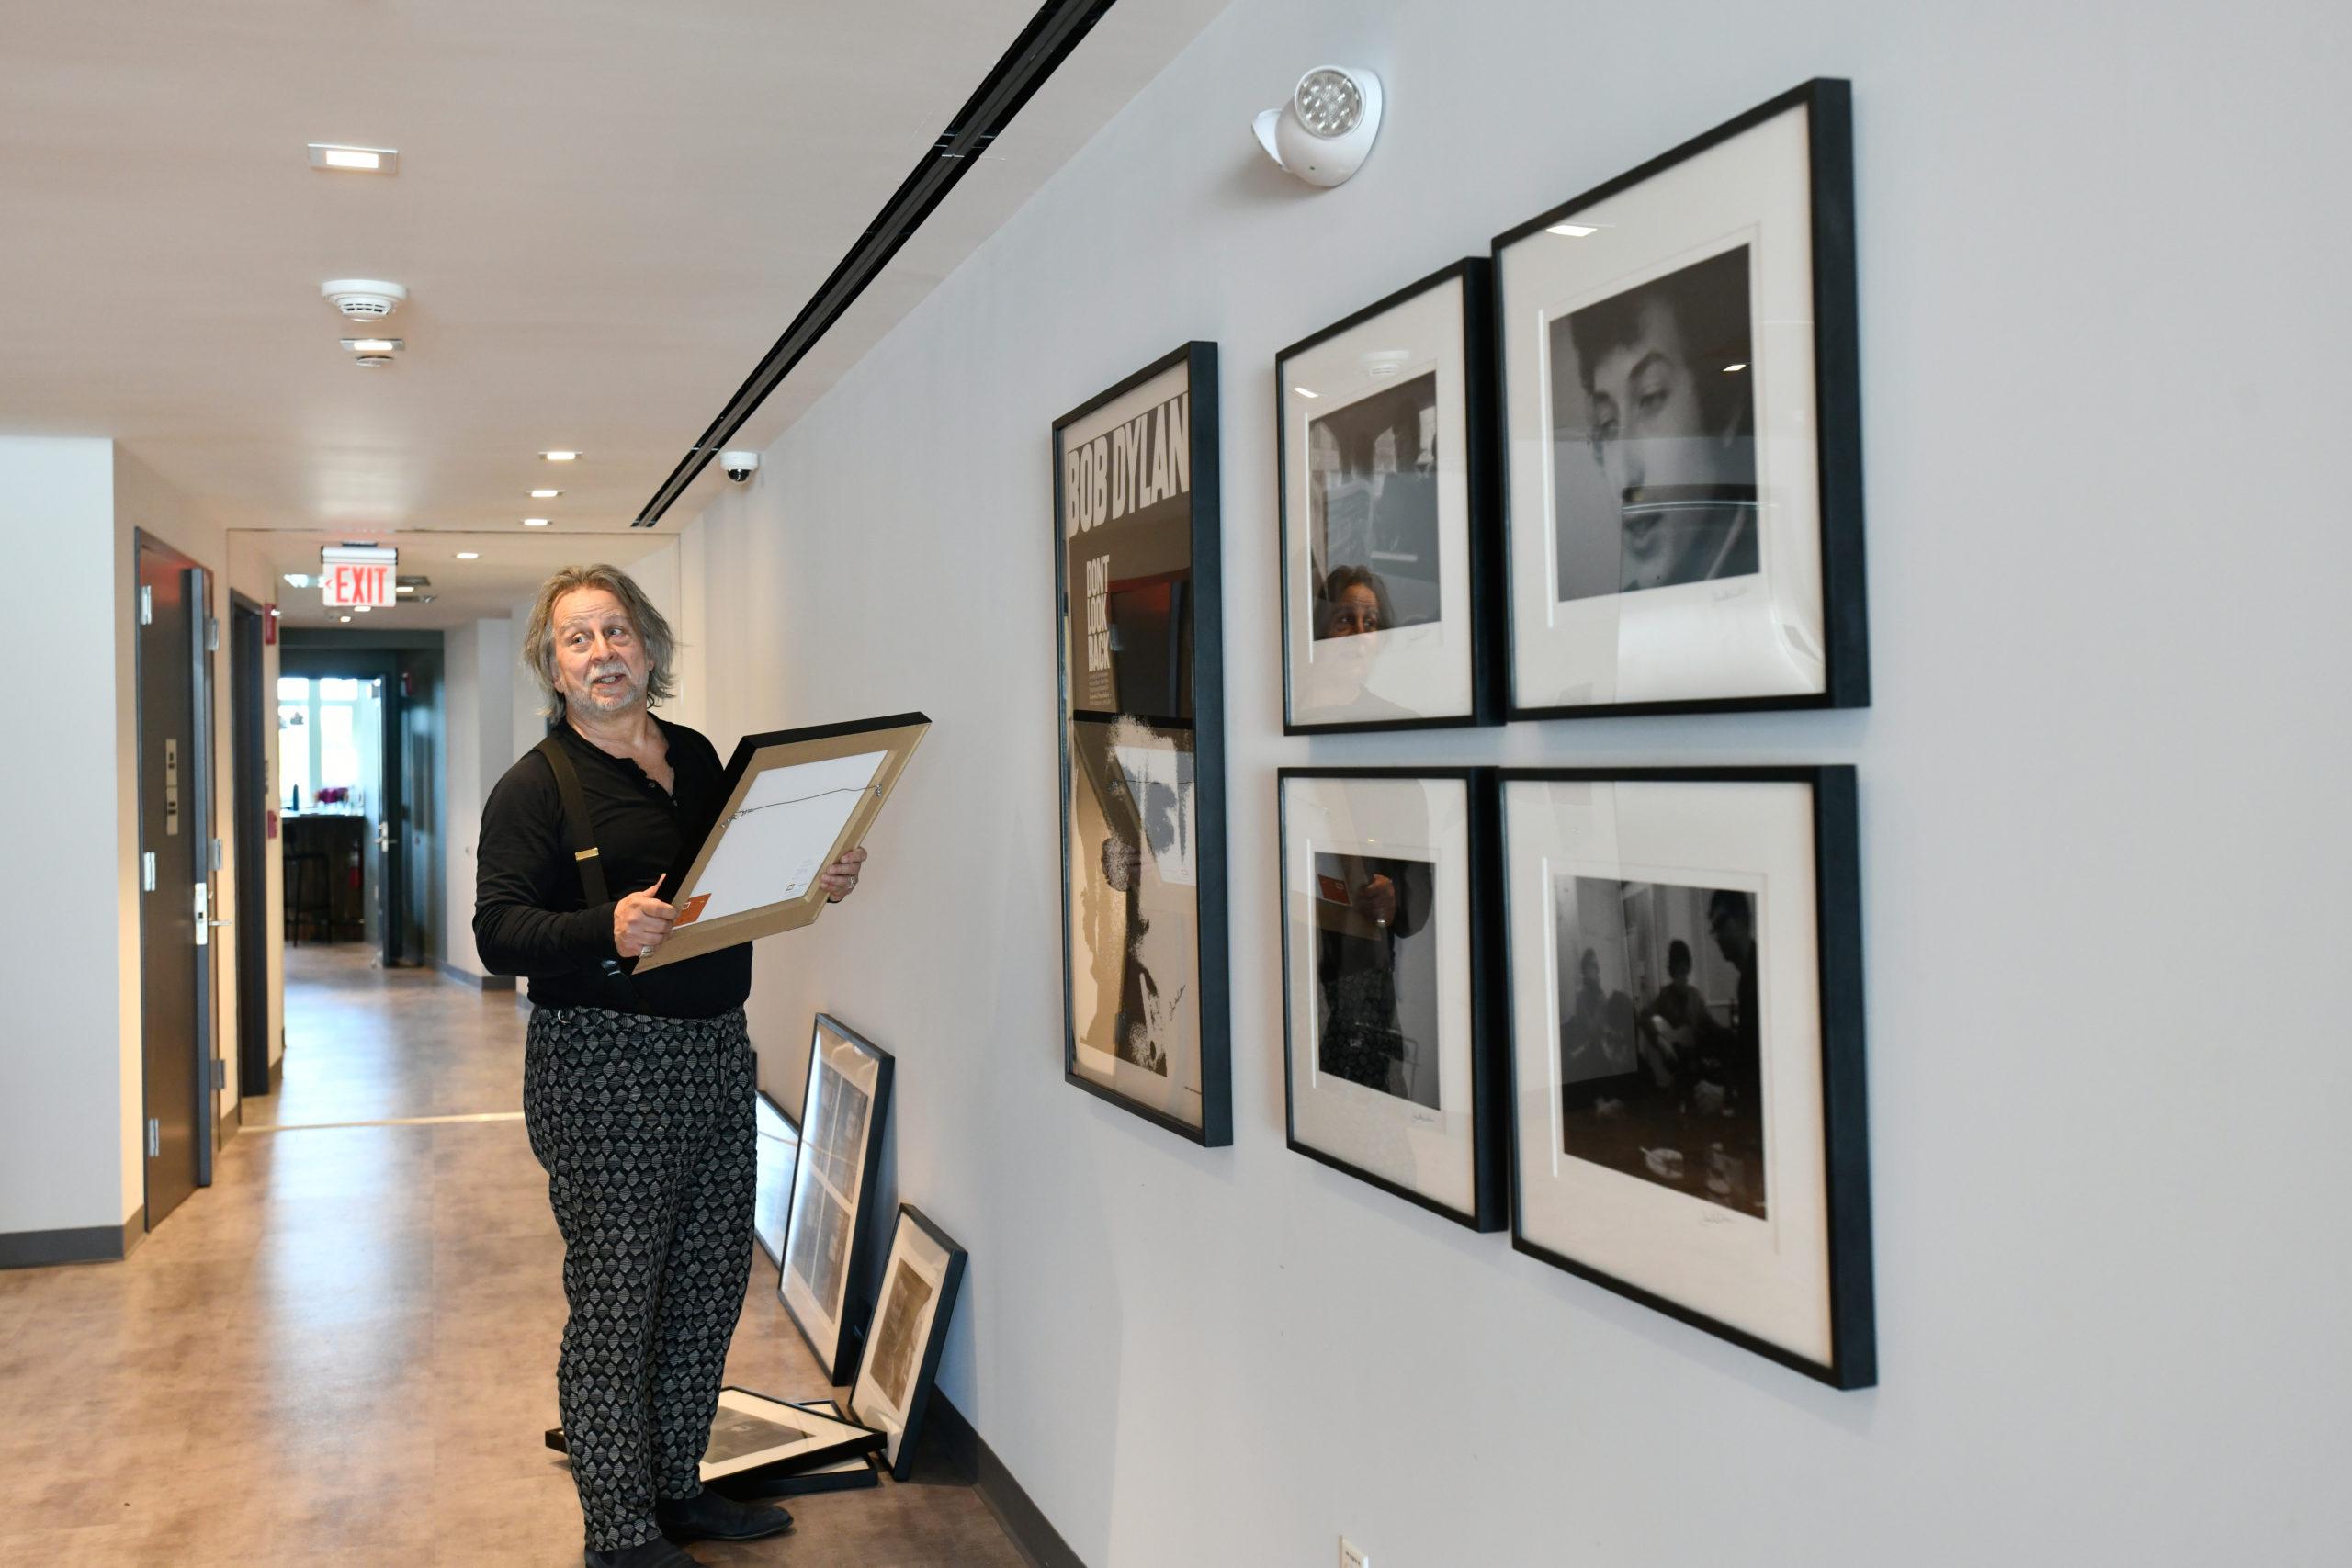 Joseph Baldassare, proprietor of Arthouse 18, hangs stills from the film